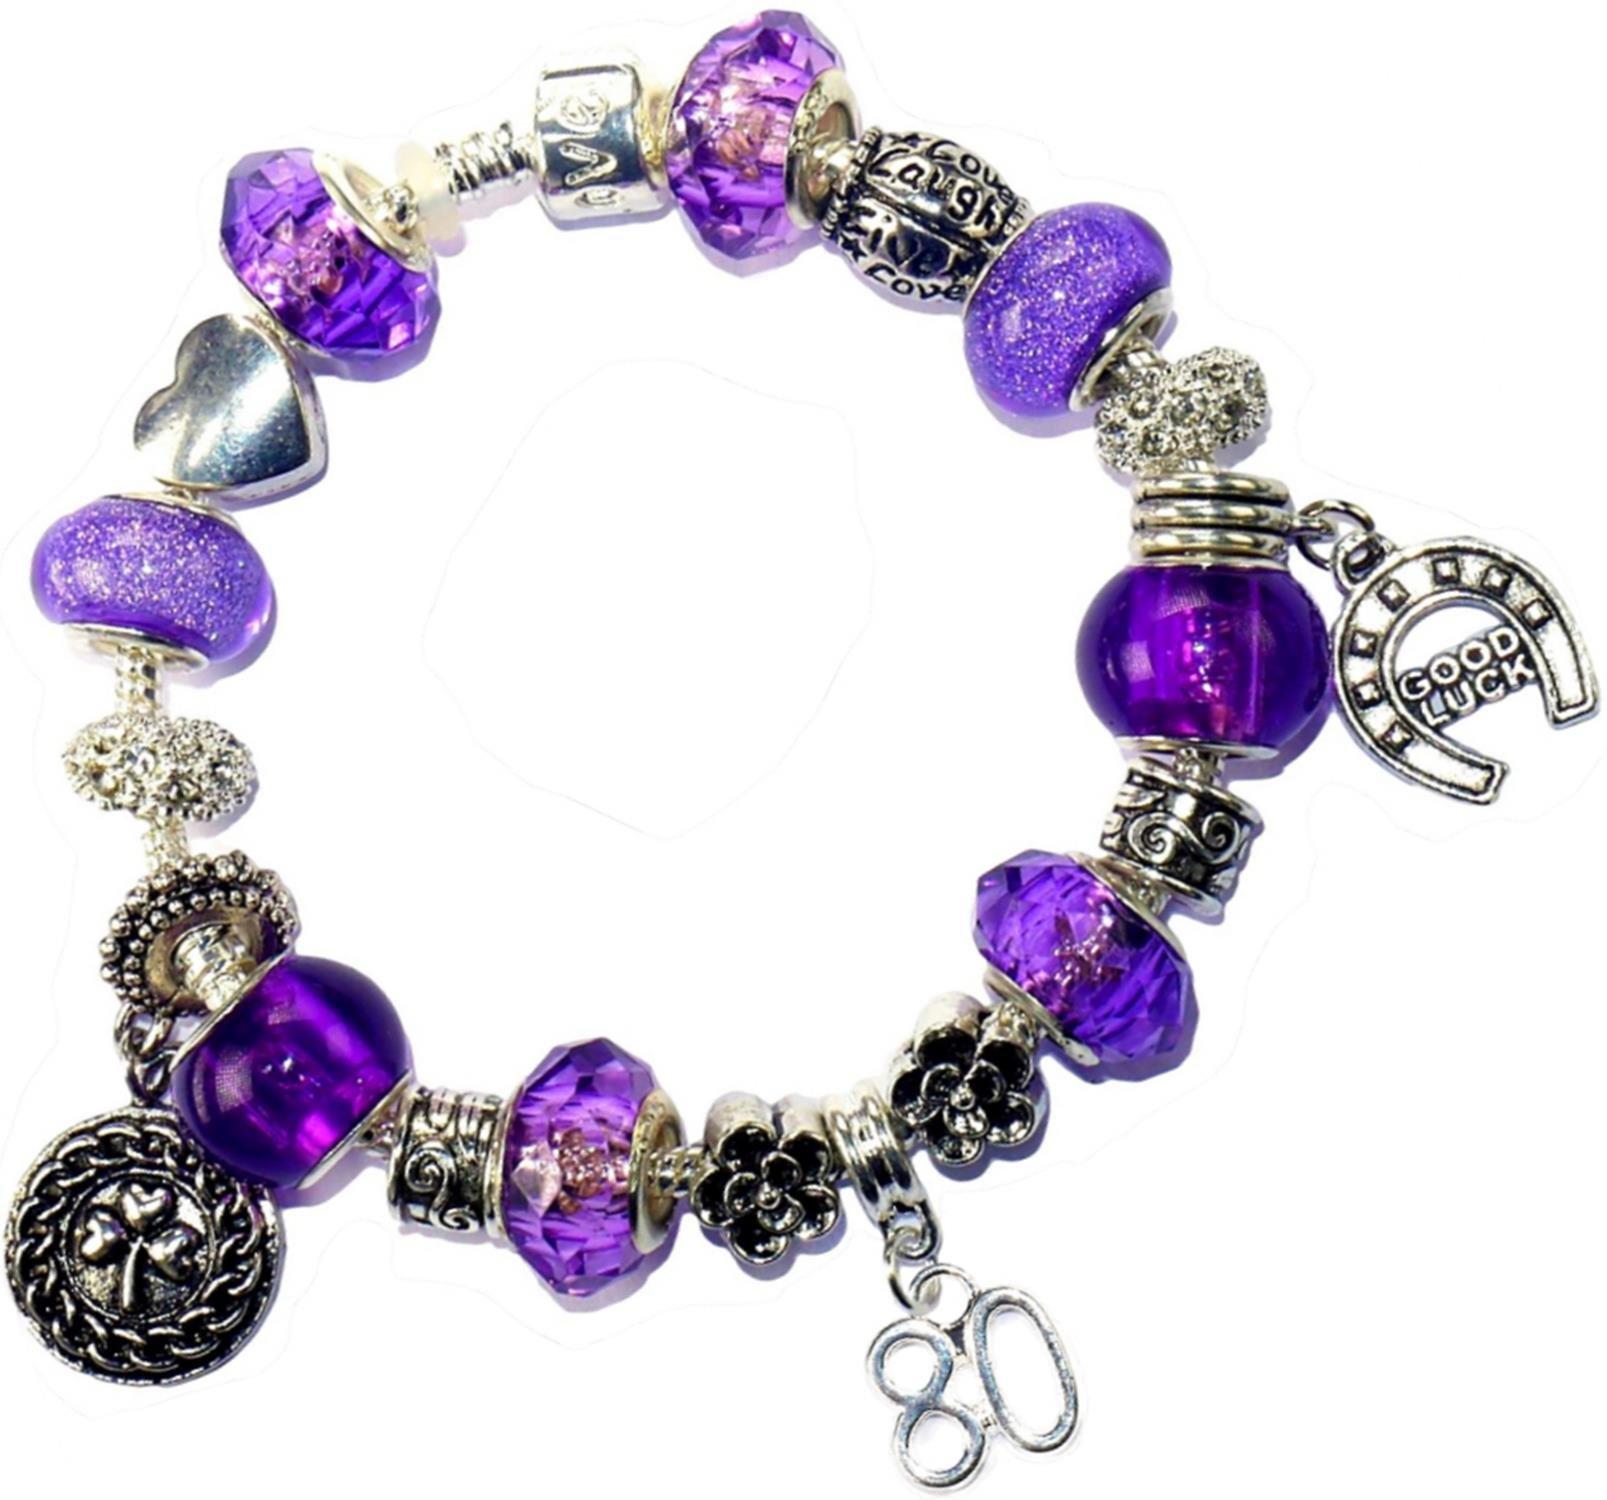 Charm Buddy 80th Birthday Purple Pandora Style Bracelet With Charms Gift Box Jewelry